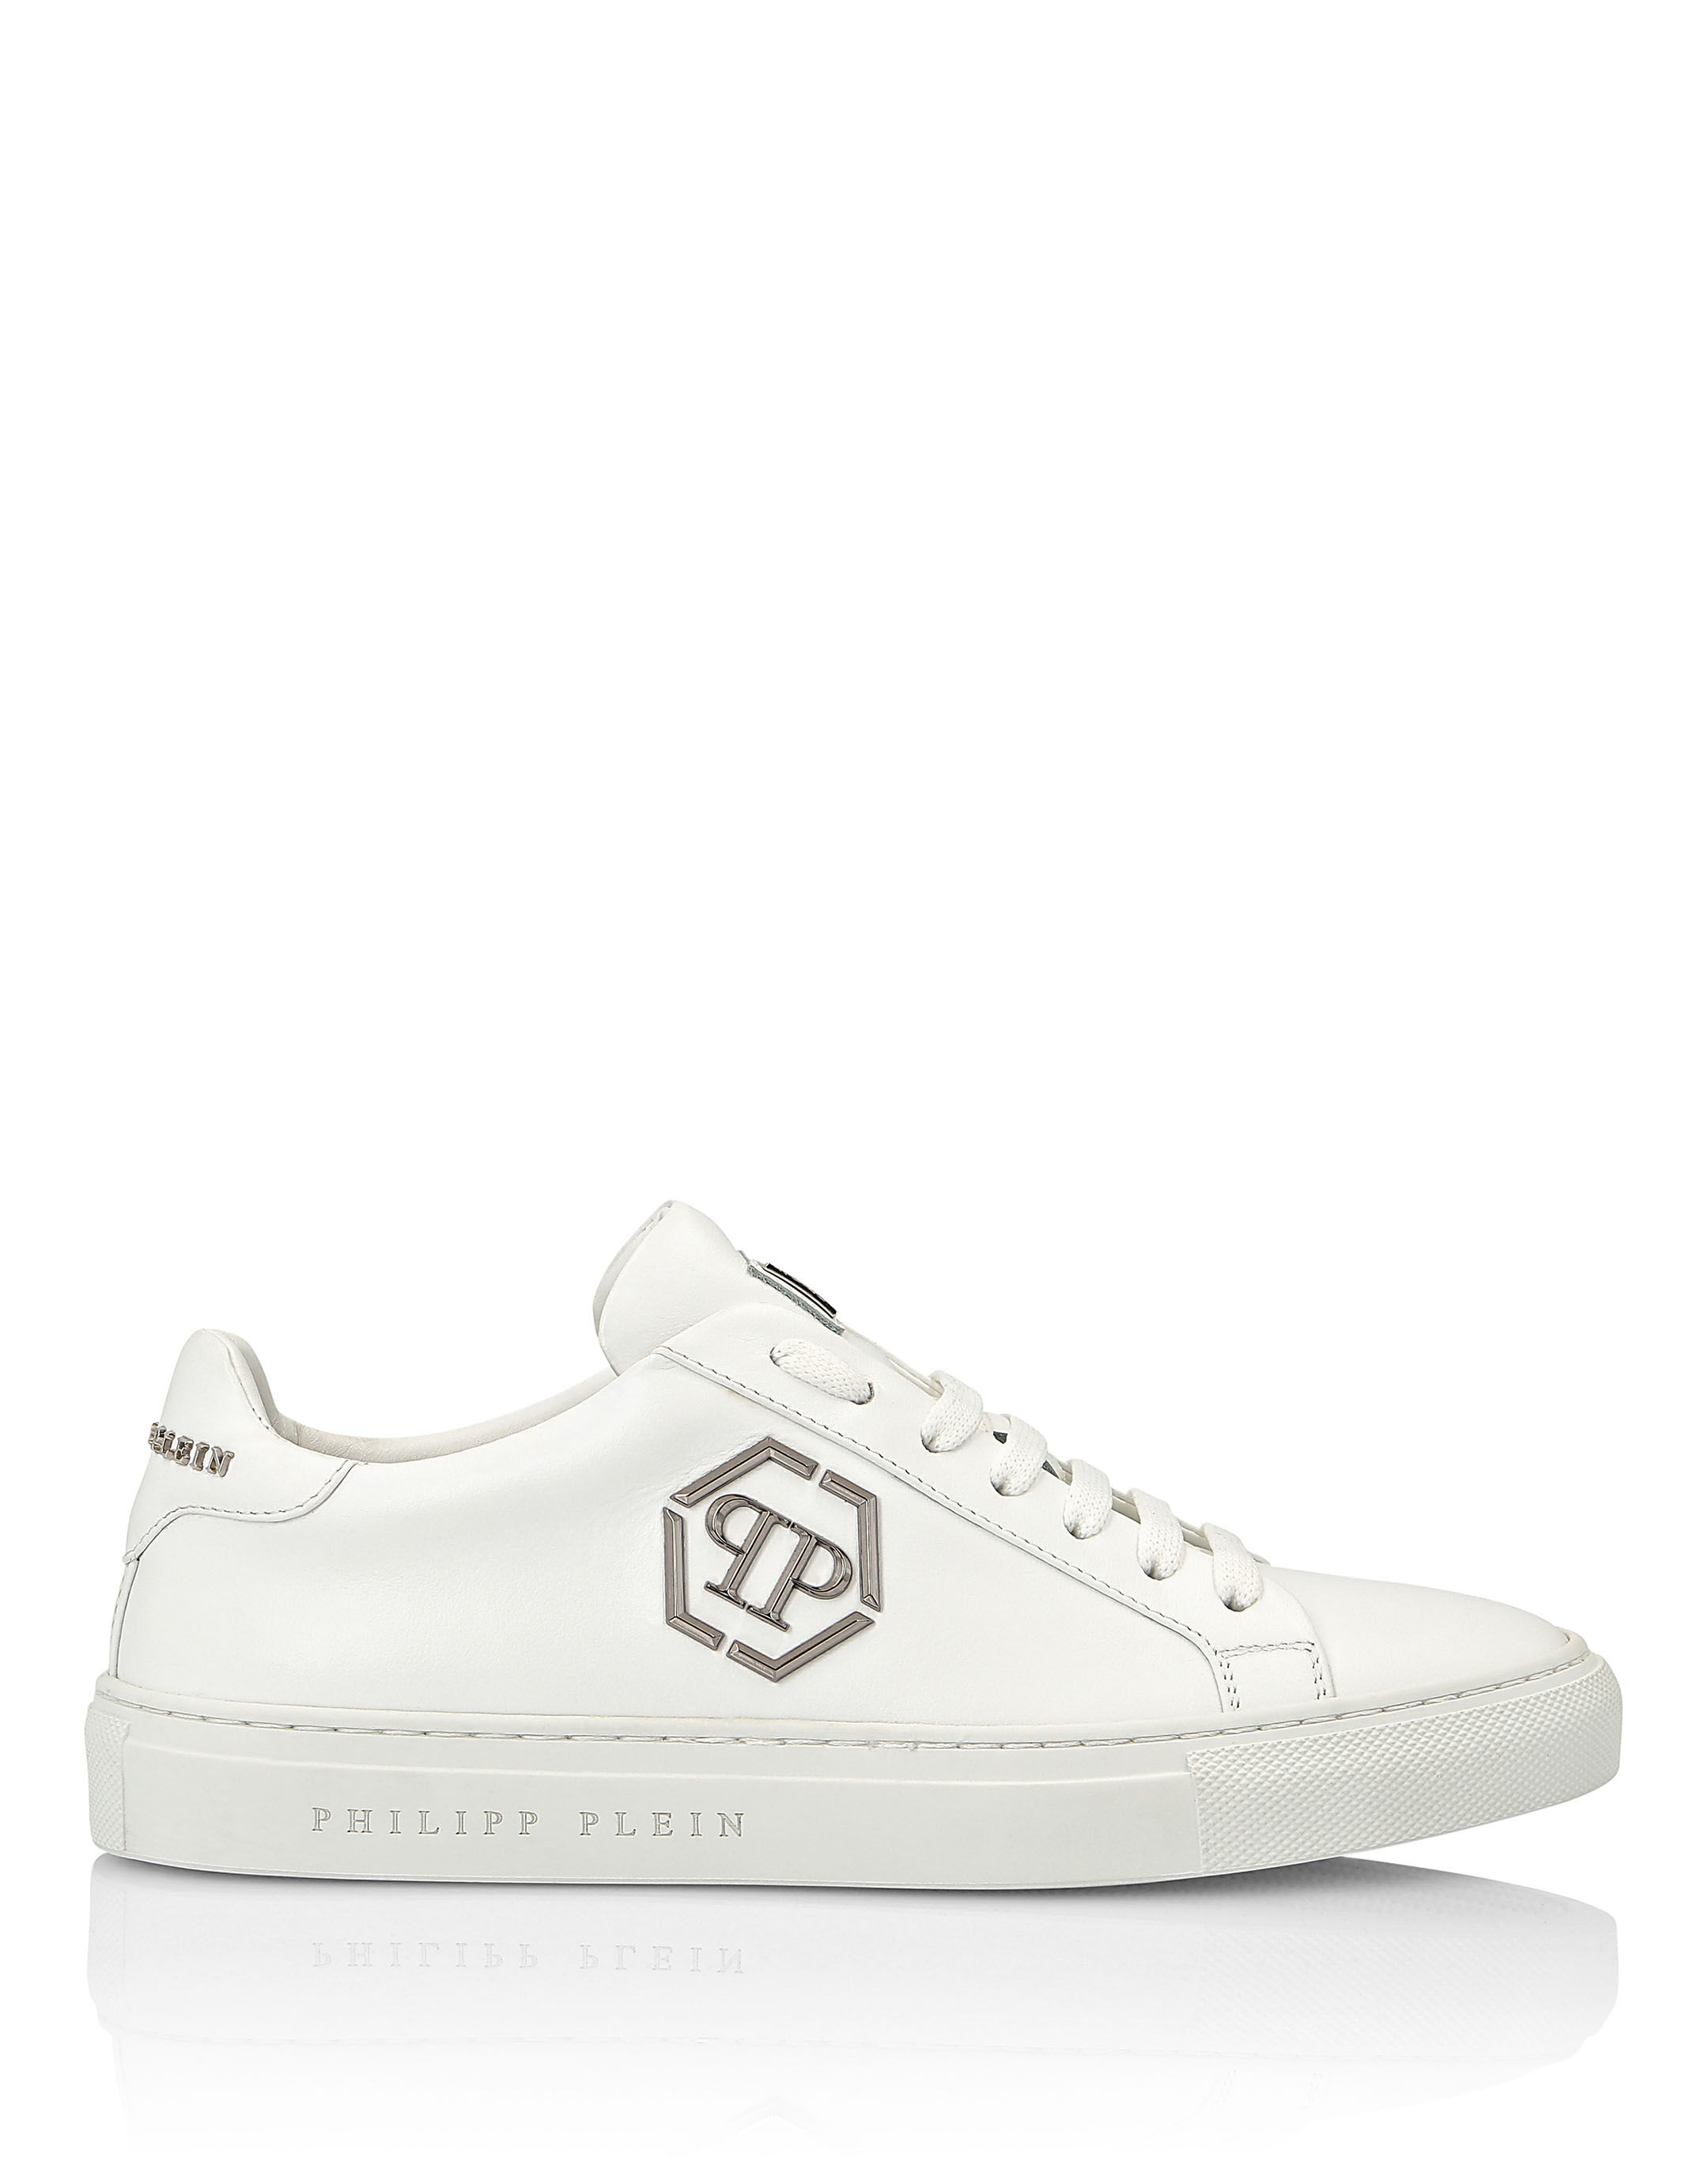 Lo-Top Sneakers Hexagon | Philipp Plein